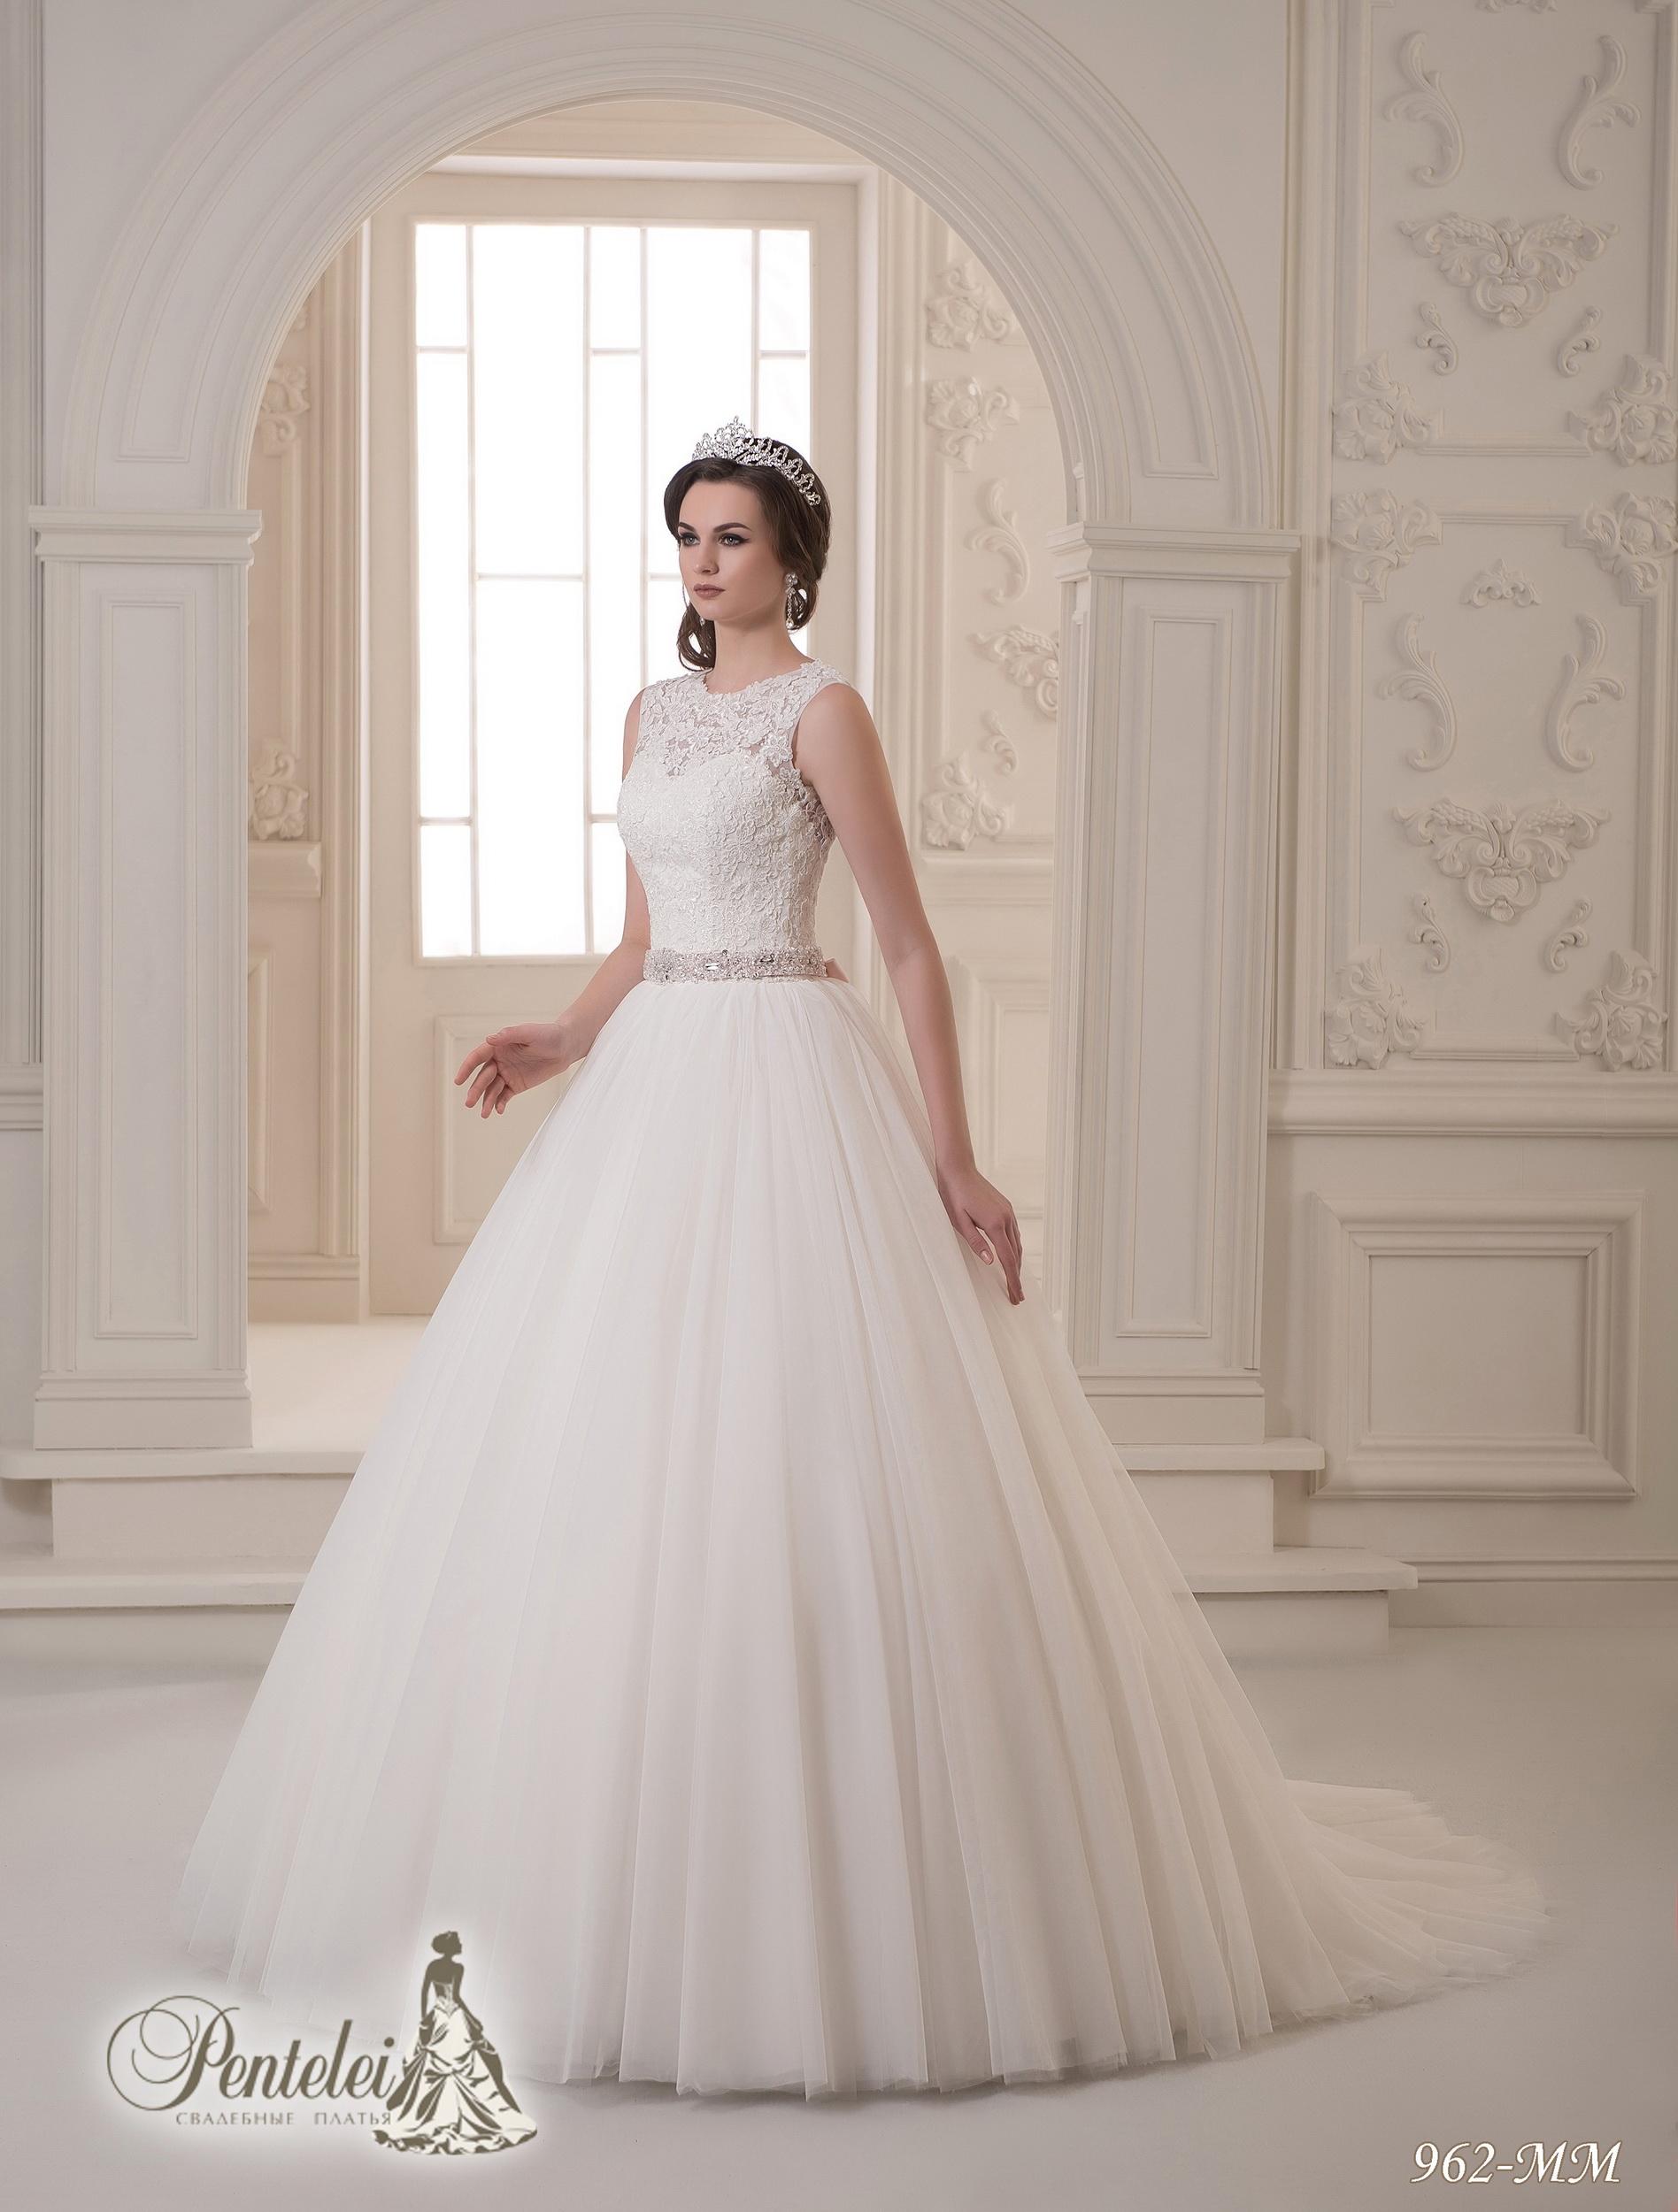 962-MM | Buy wedding dresses wholesale from Pentelei